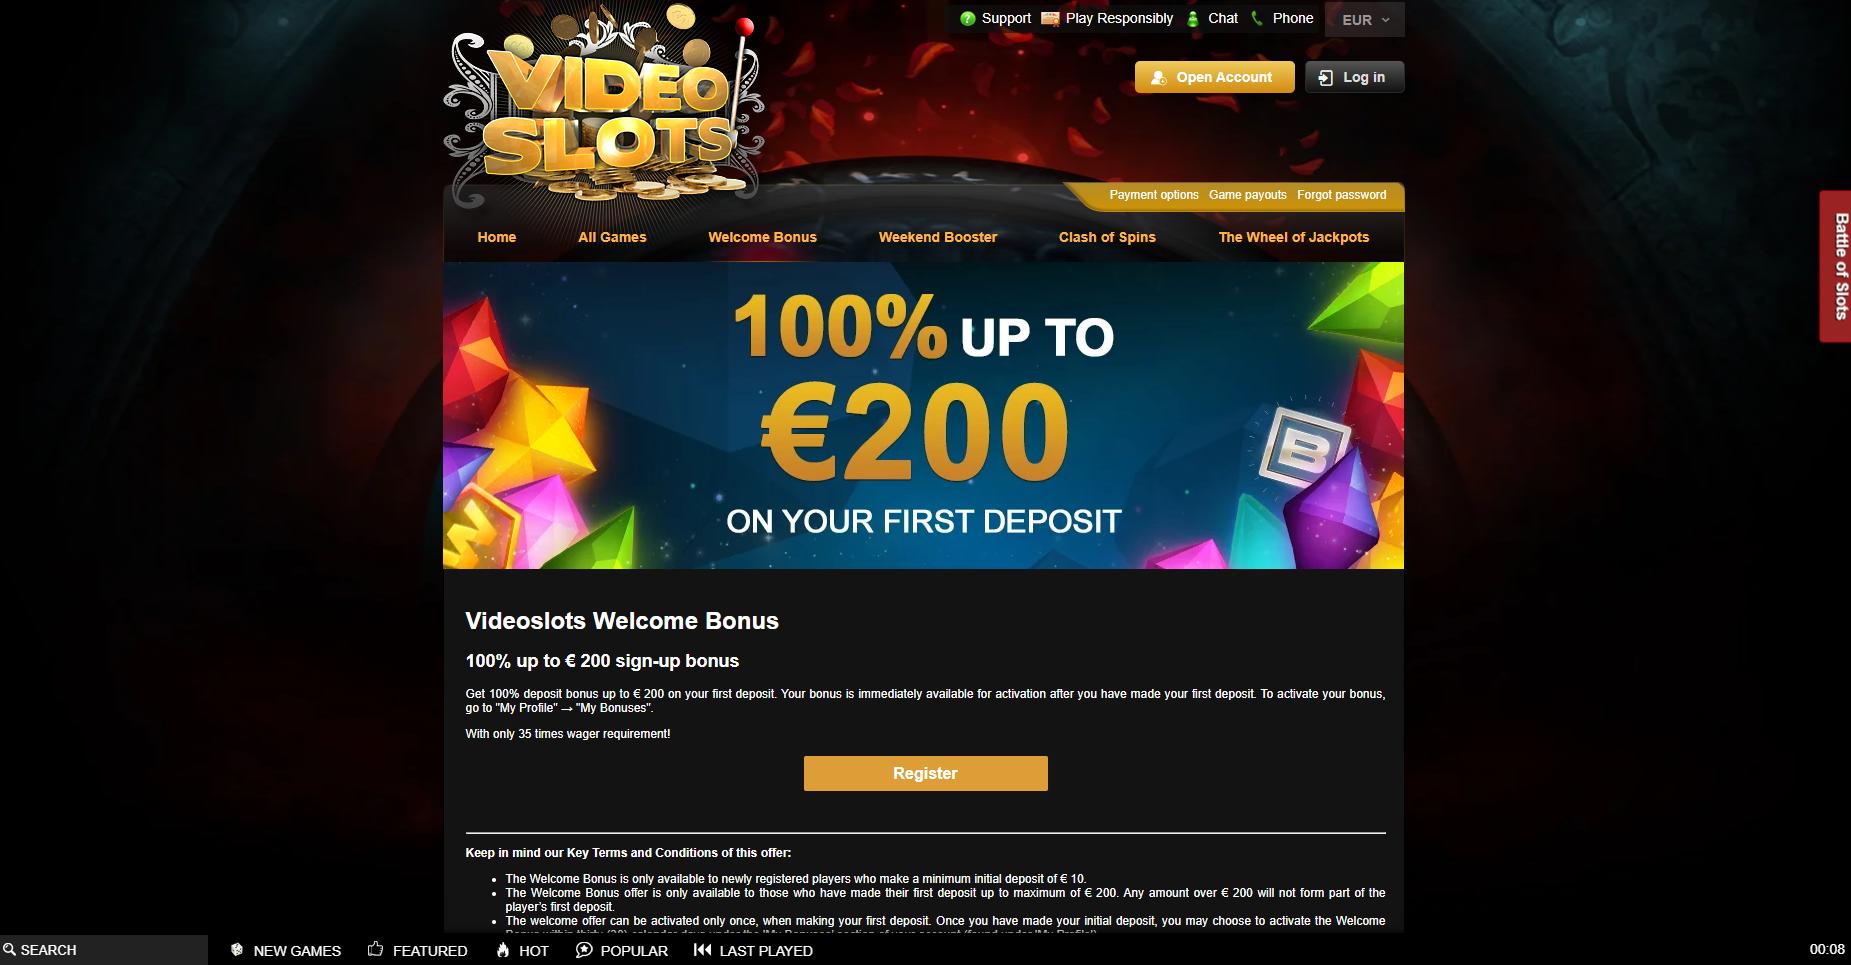 Videoslots webbversion 451140